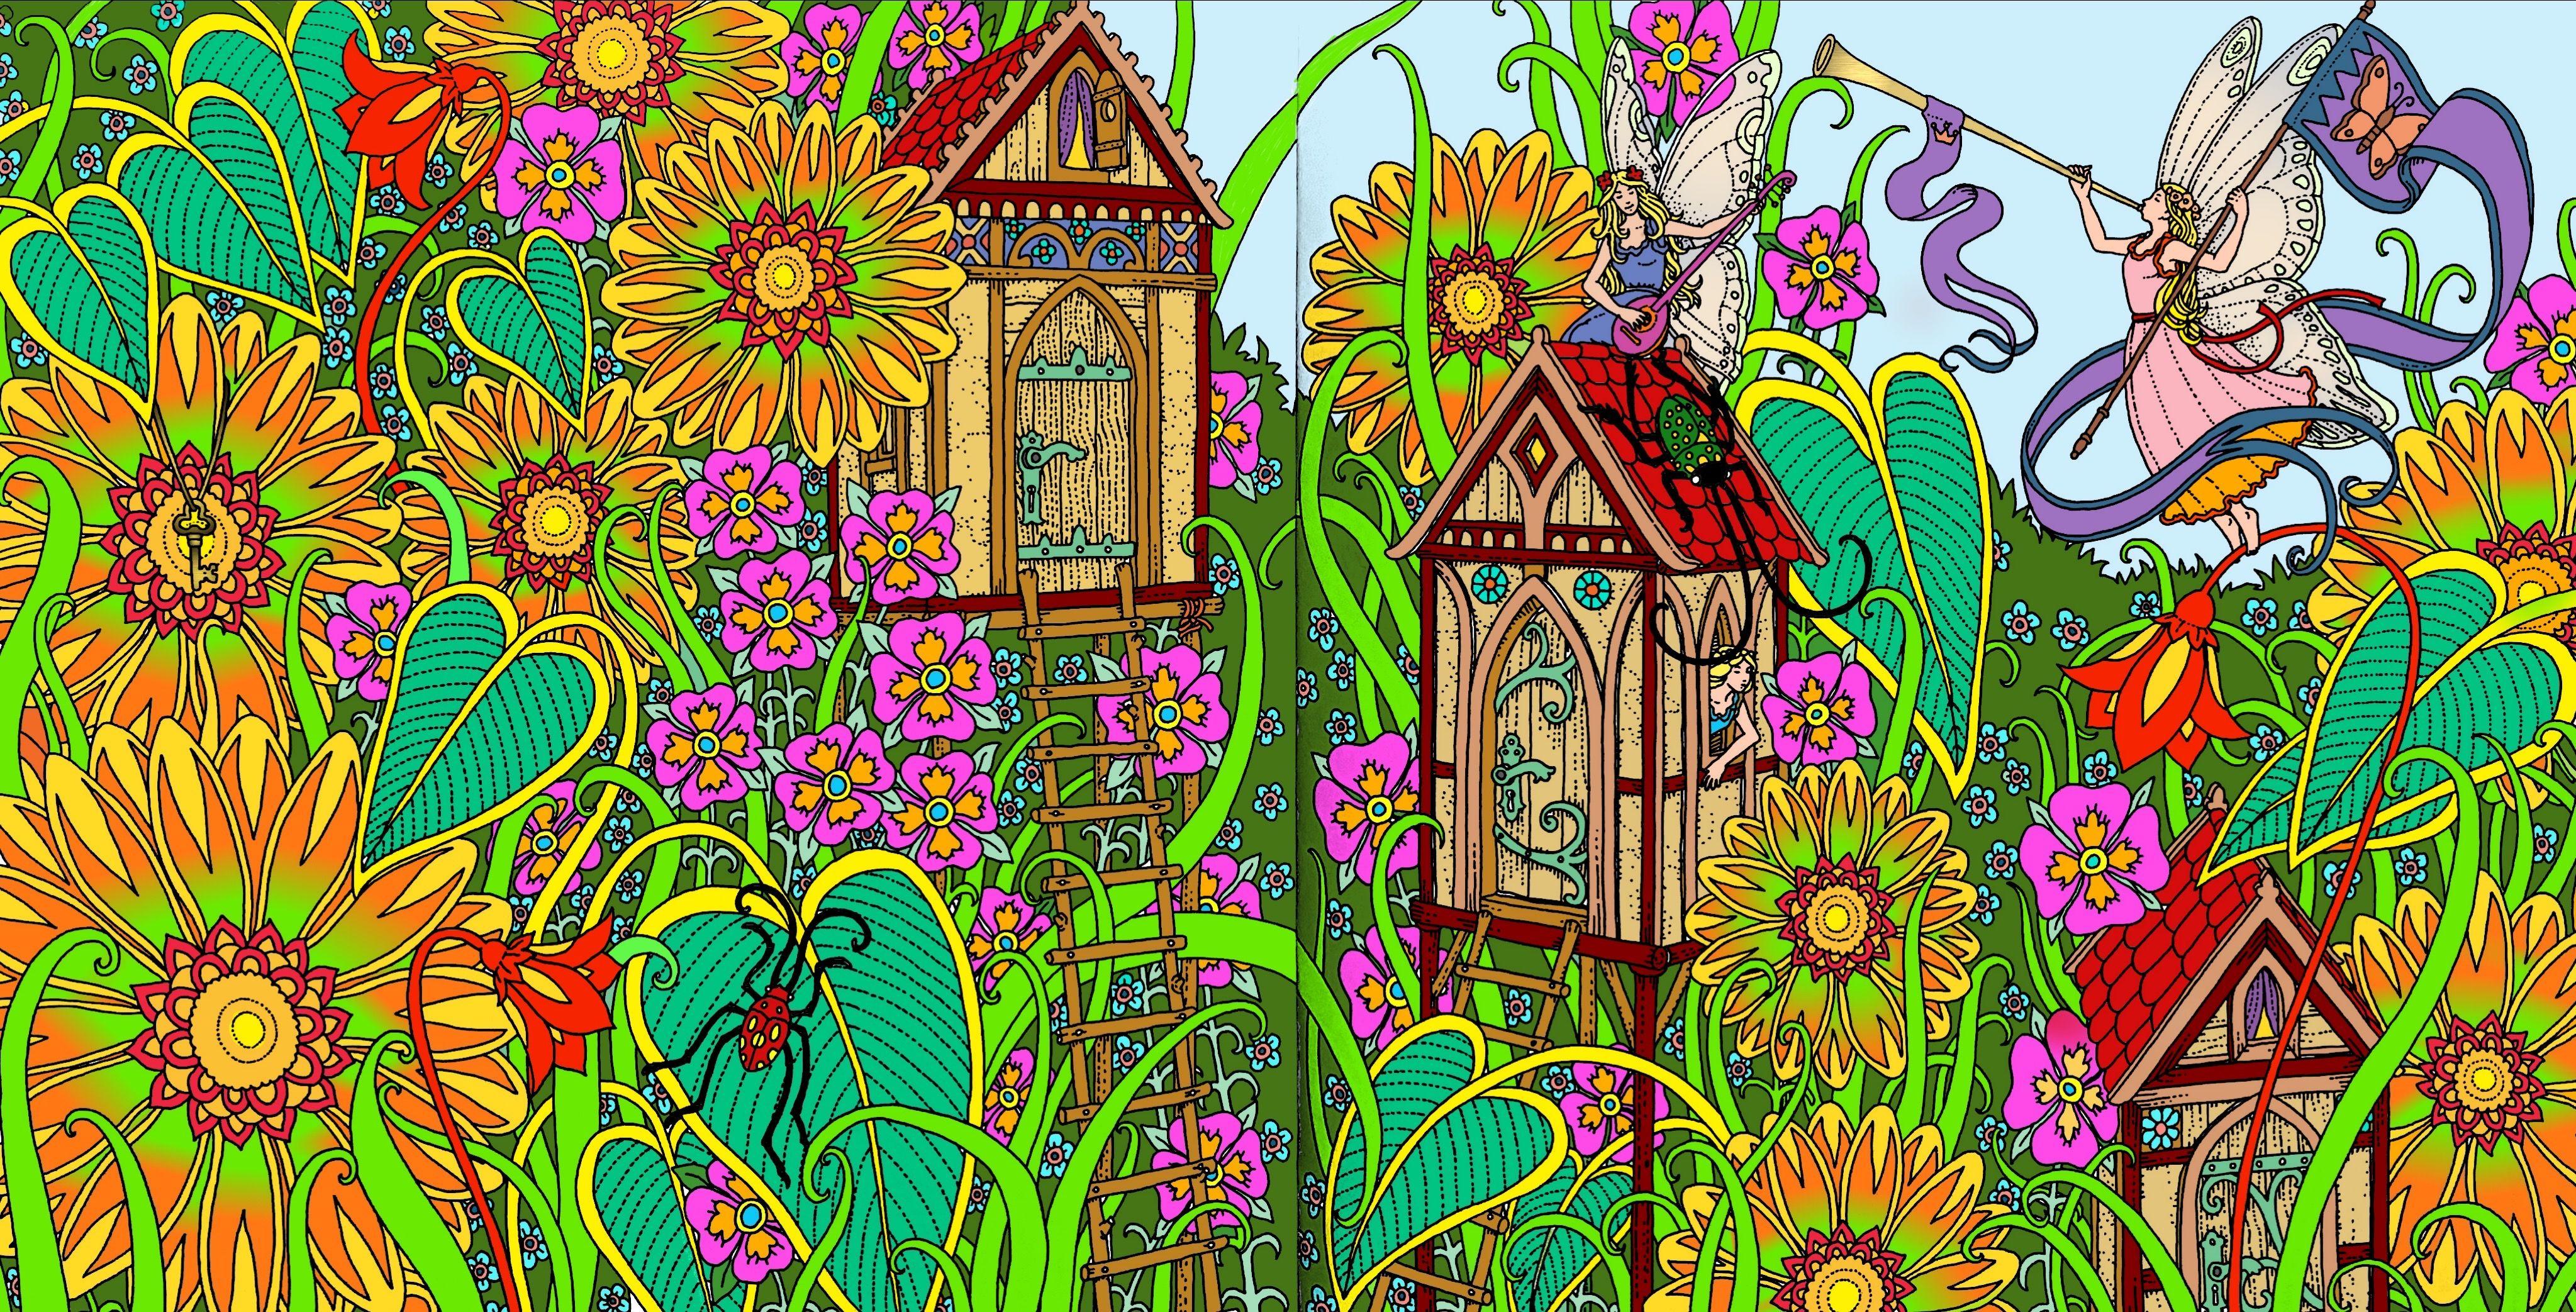 Coloring Book Zemlja Snova By Tomislav Tomic Digitally Colored Using Pigment App On Ipad Pro Coloring Books Coloring Book Pages Painting